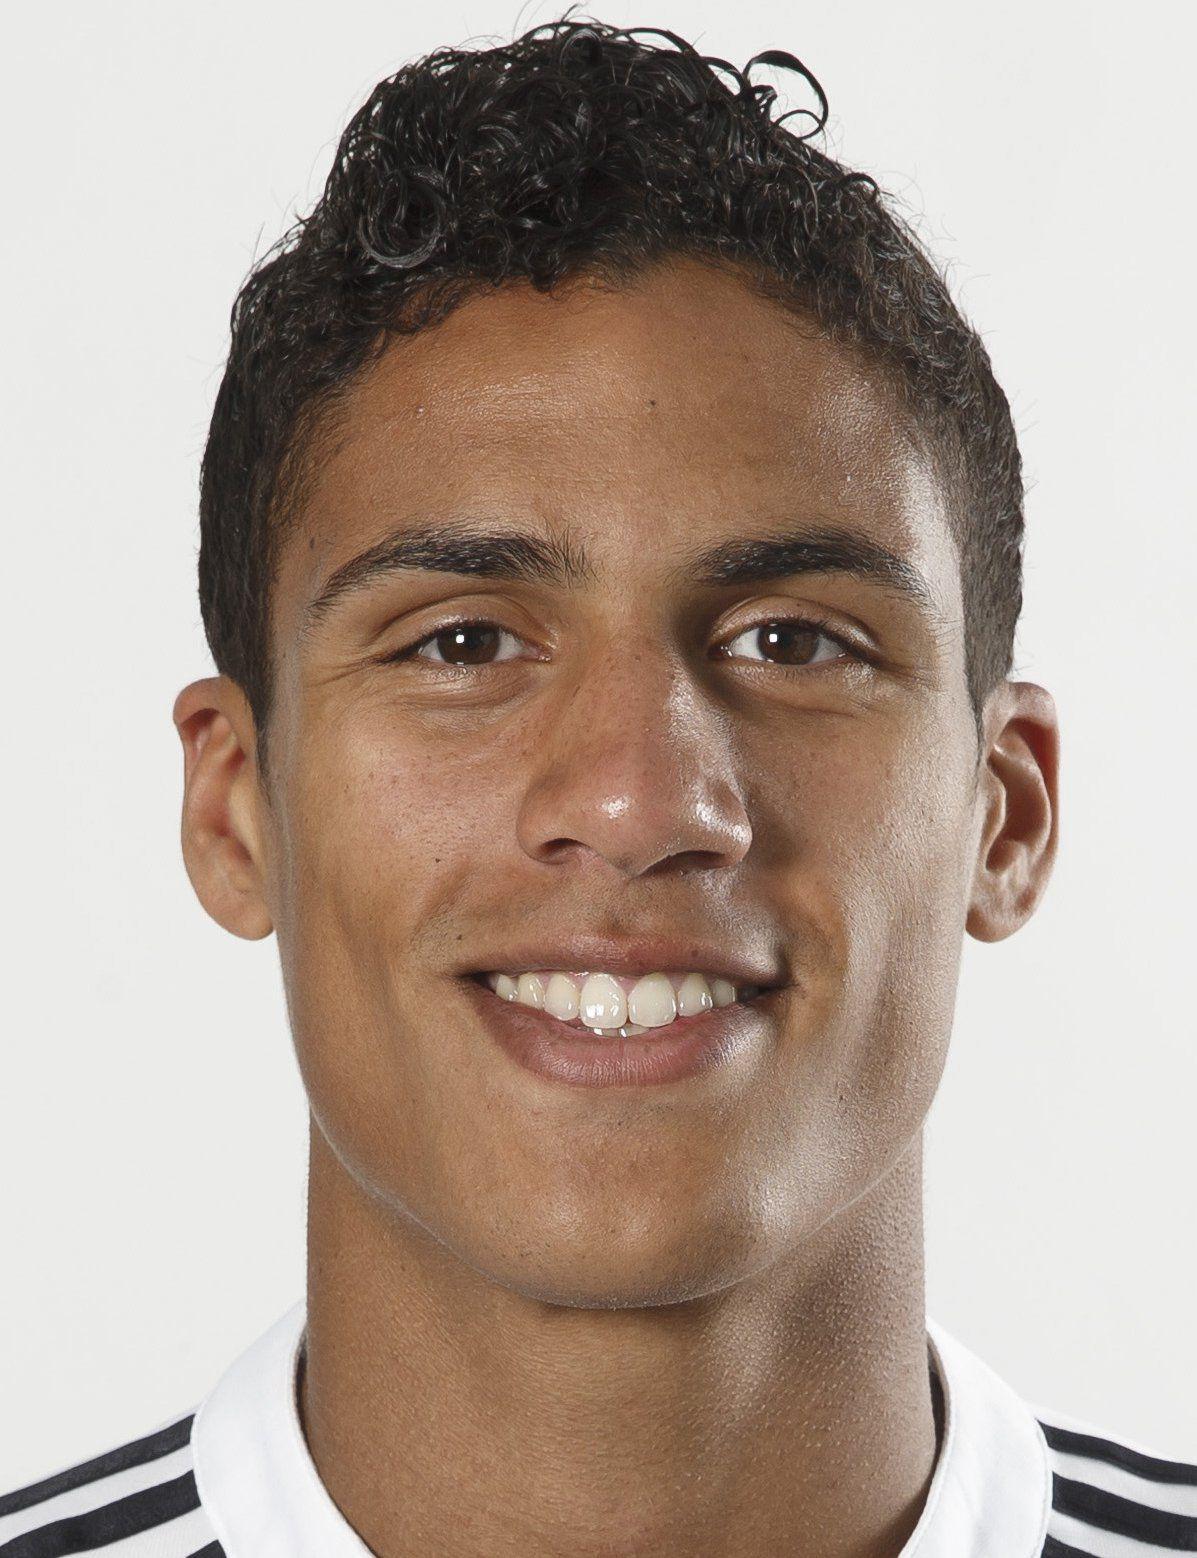 Rapha l Varane Player Profile 17 18